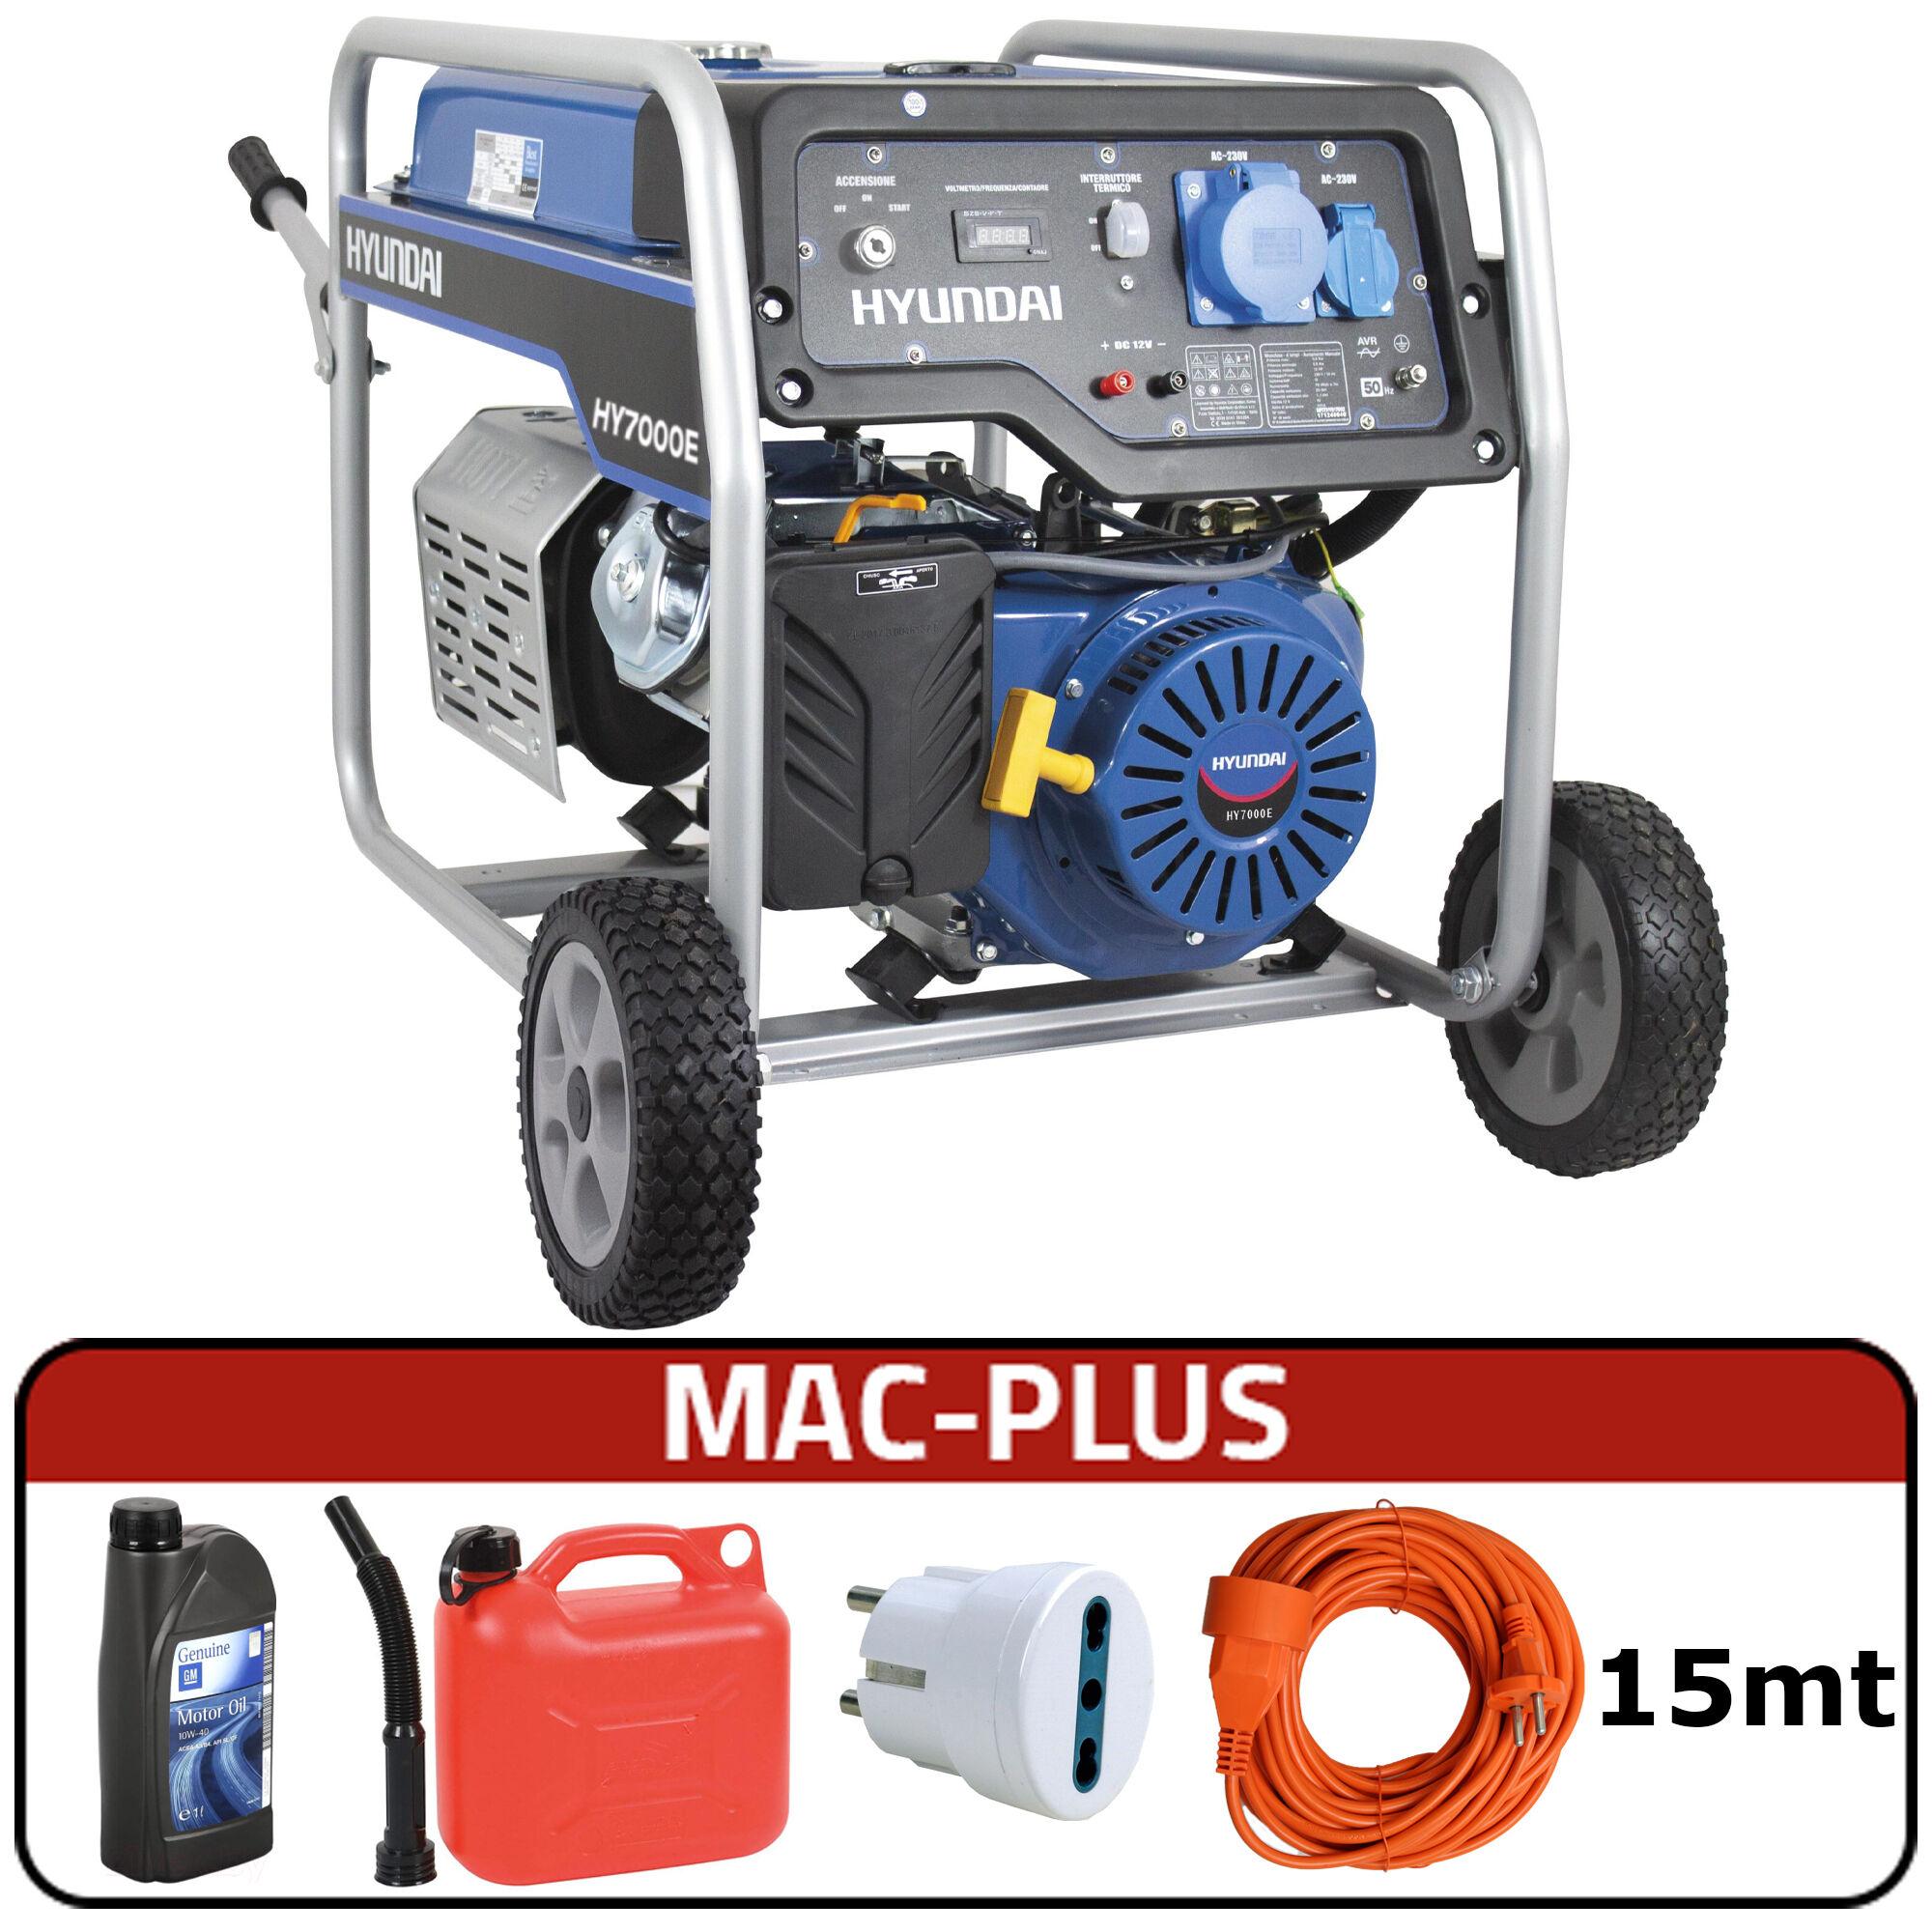 hyundai generatore di corrente hyundai 65017 hy7000e con avr + mac-plus